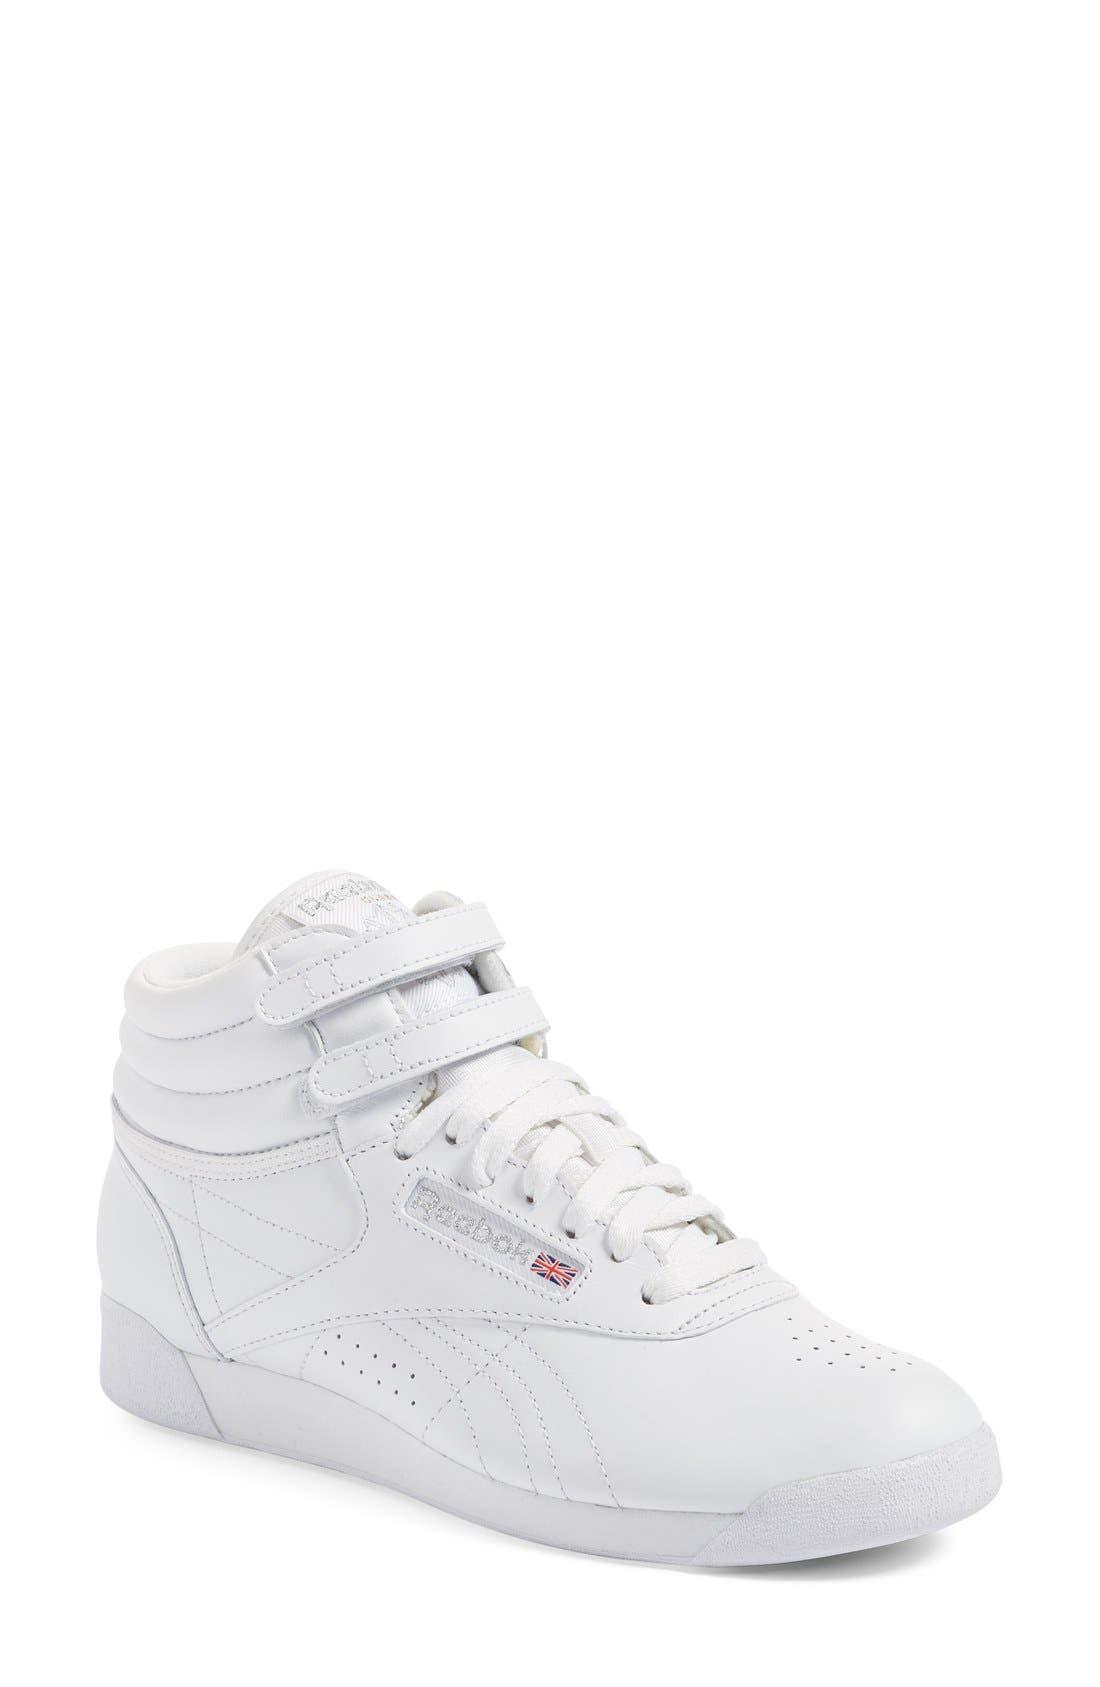 'Freestyle Hi' Sneaker,                             Main thumbnail 1, color,                             WHITE/ SILVER